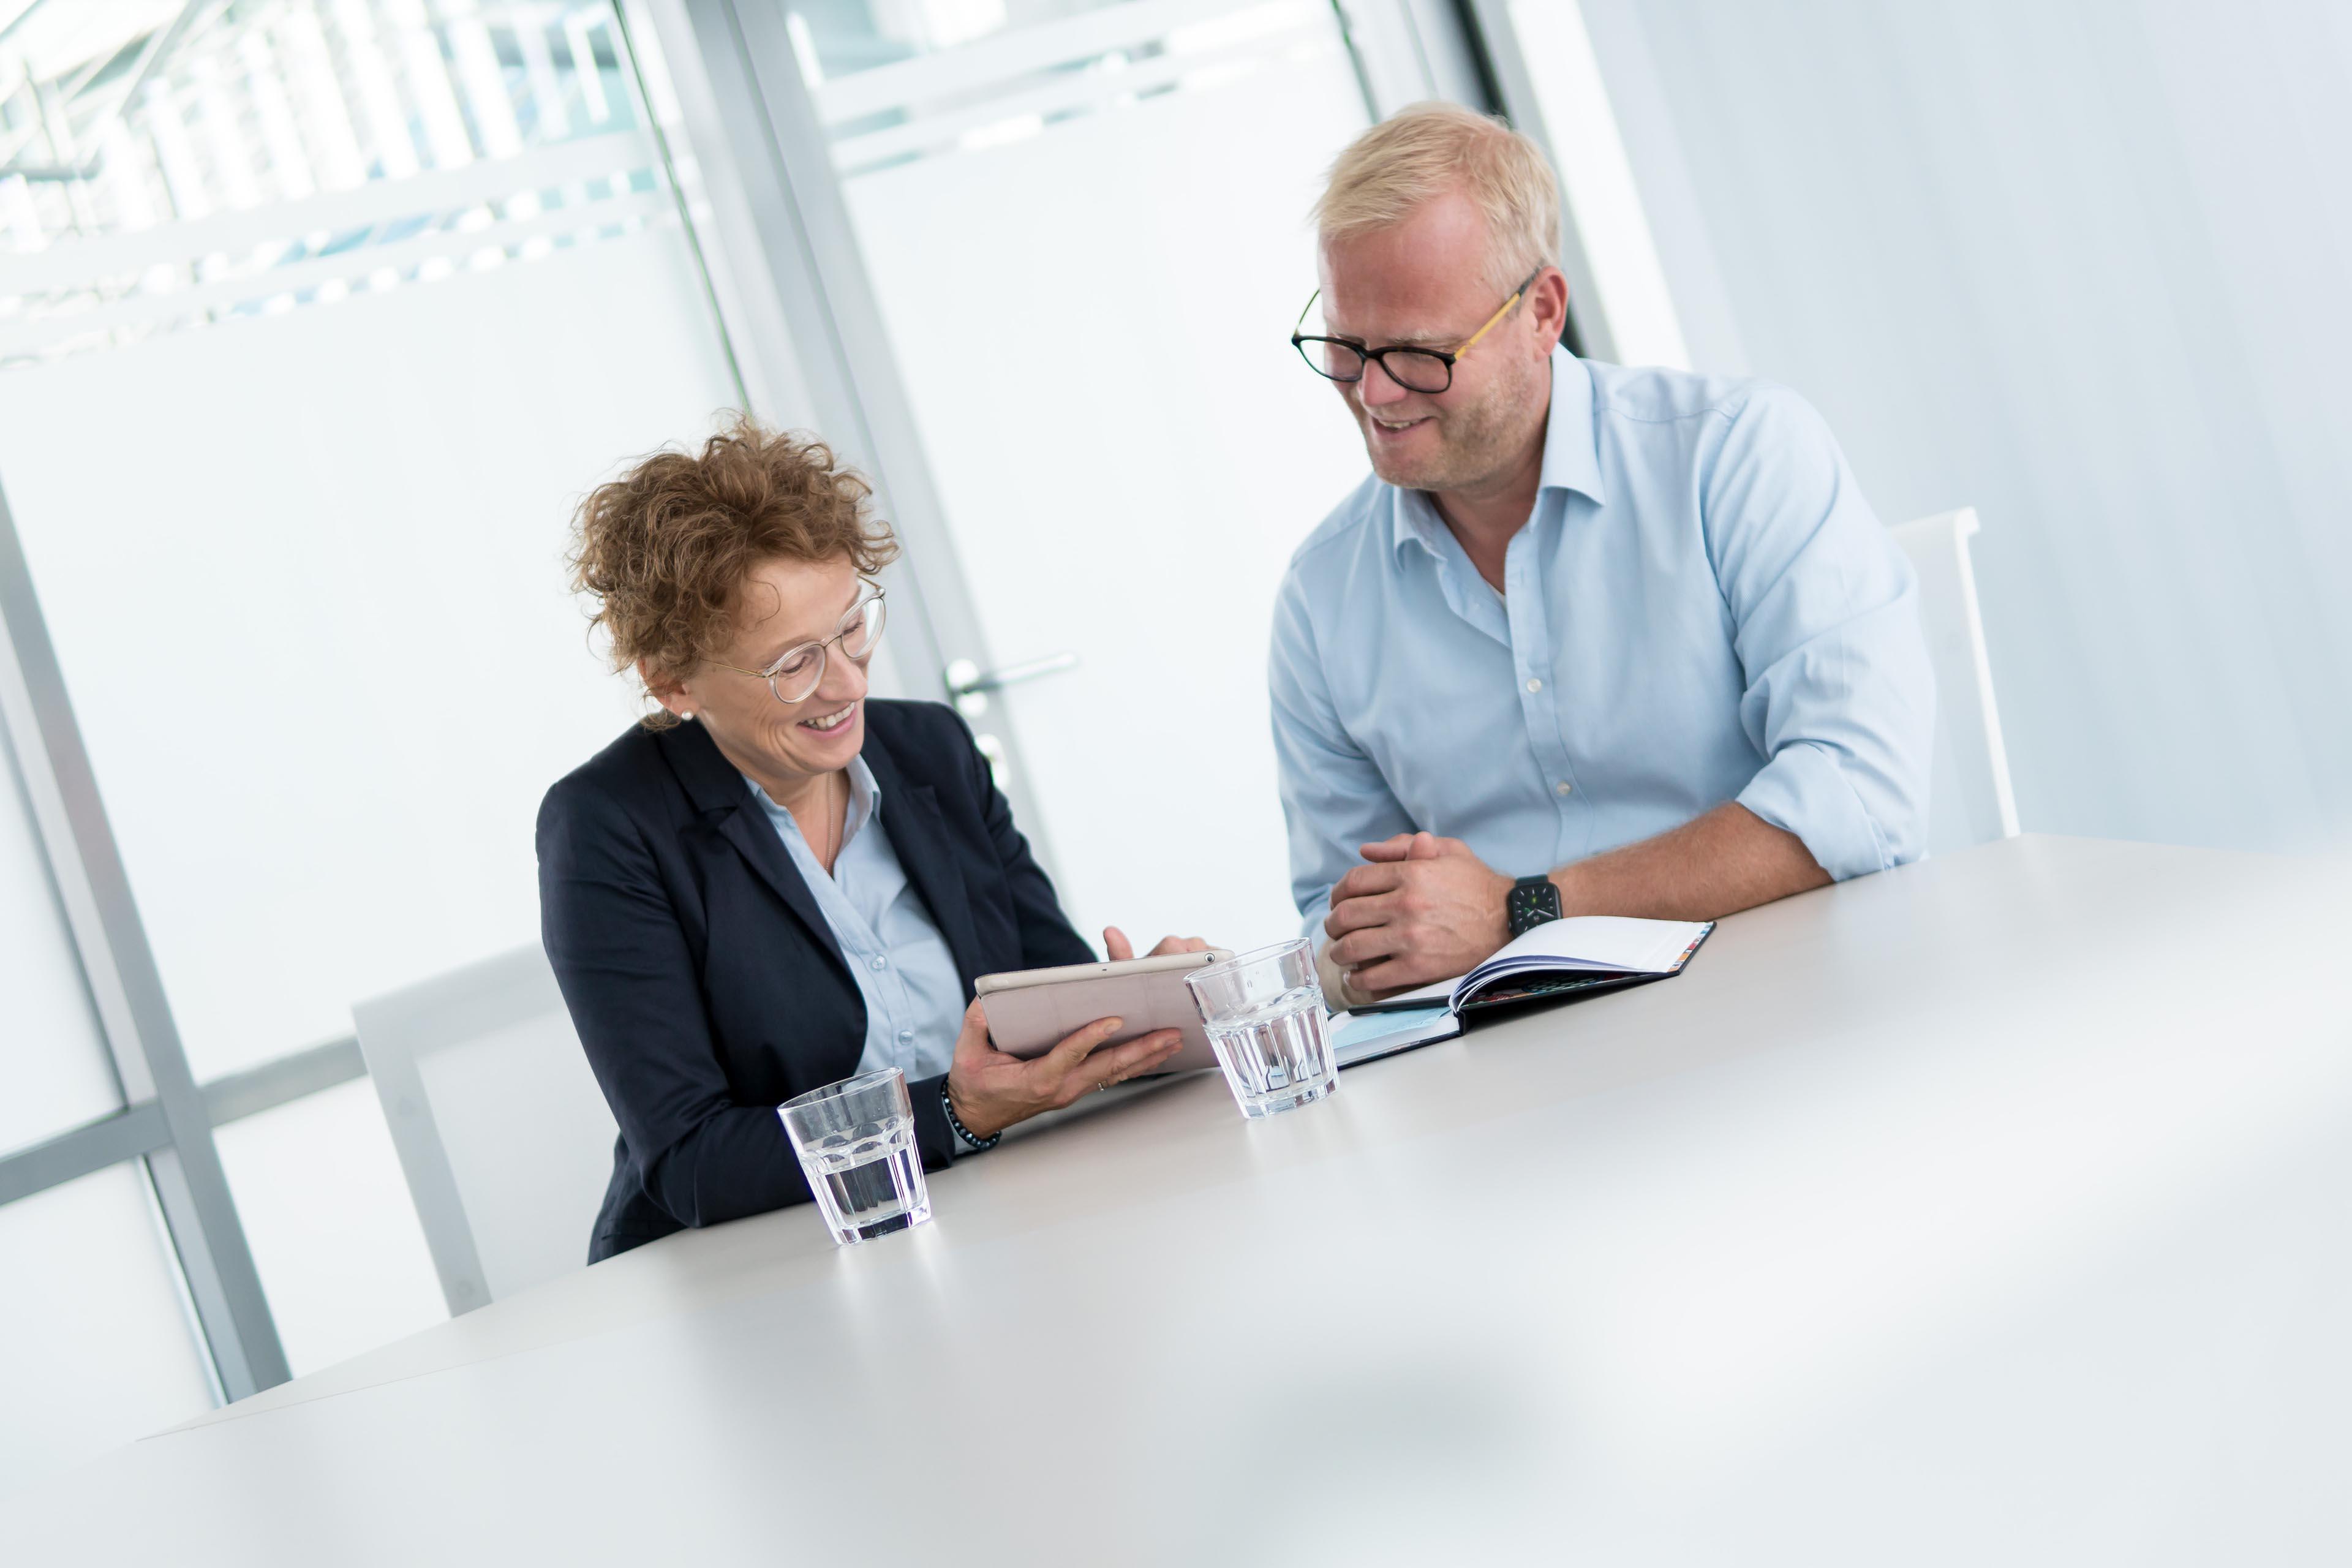 Maike Grünebaum Consulting | Im Beratungsgespräch